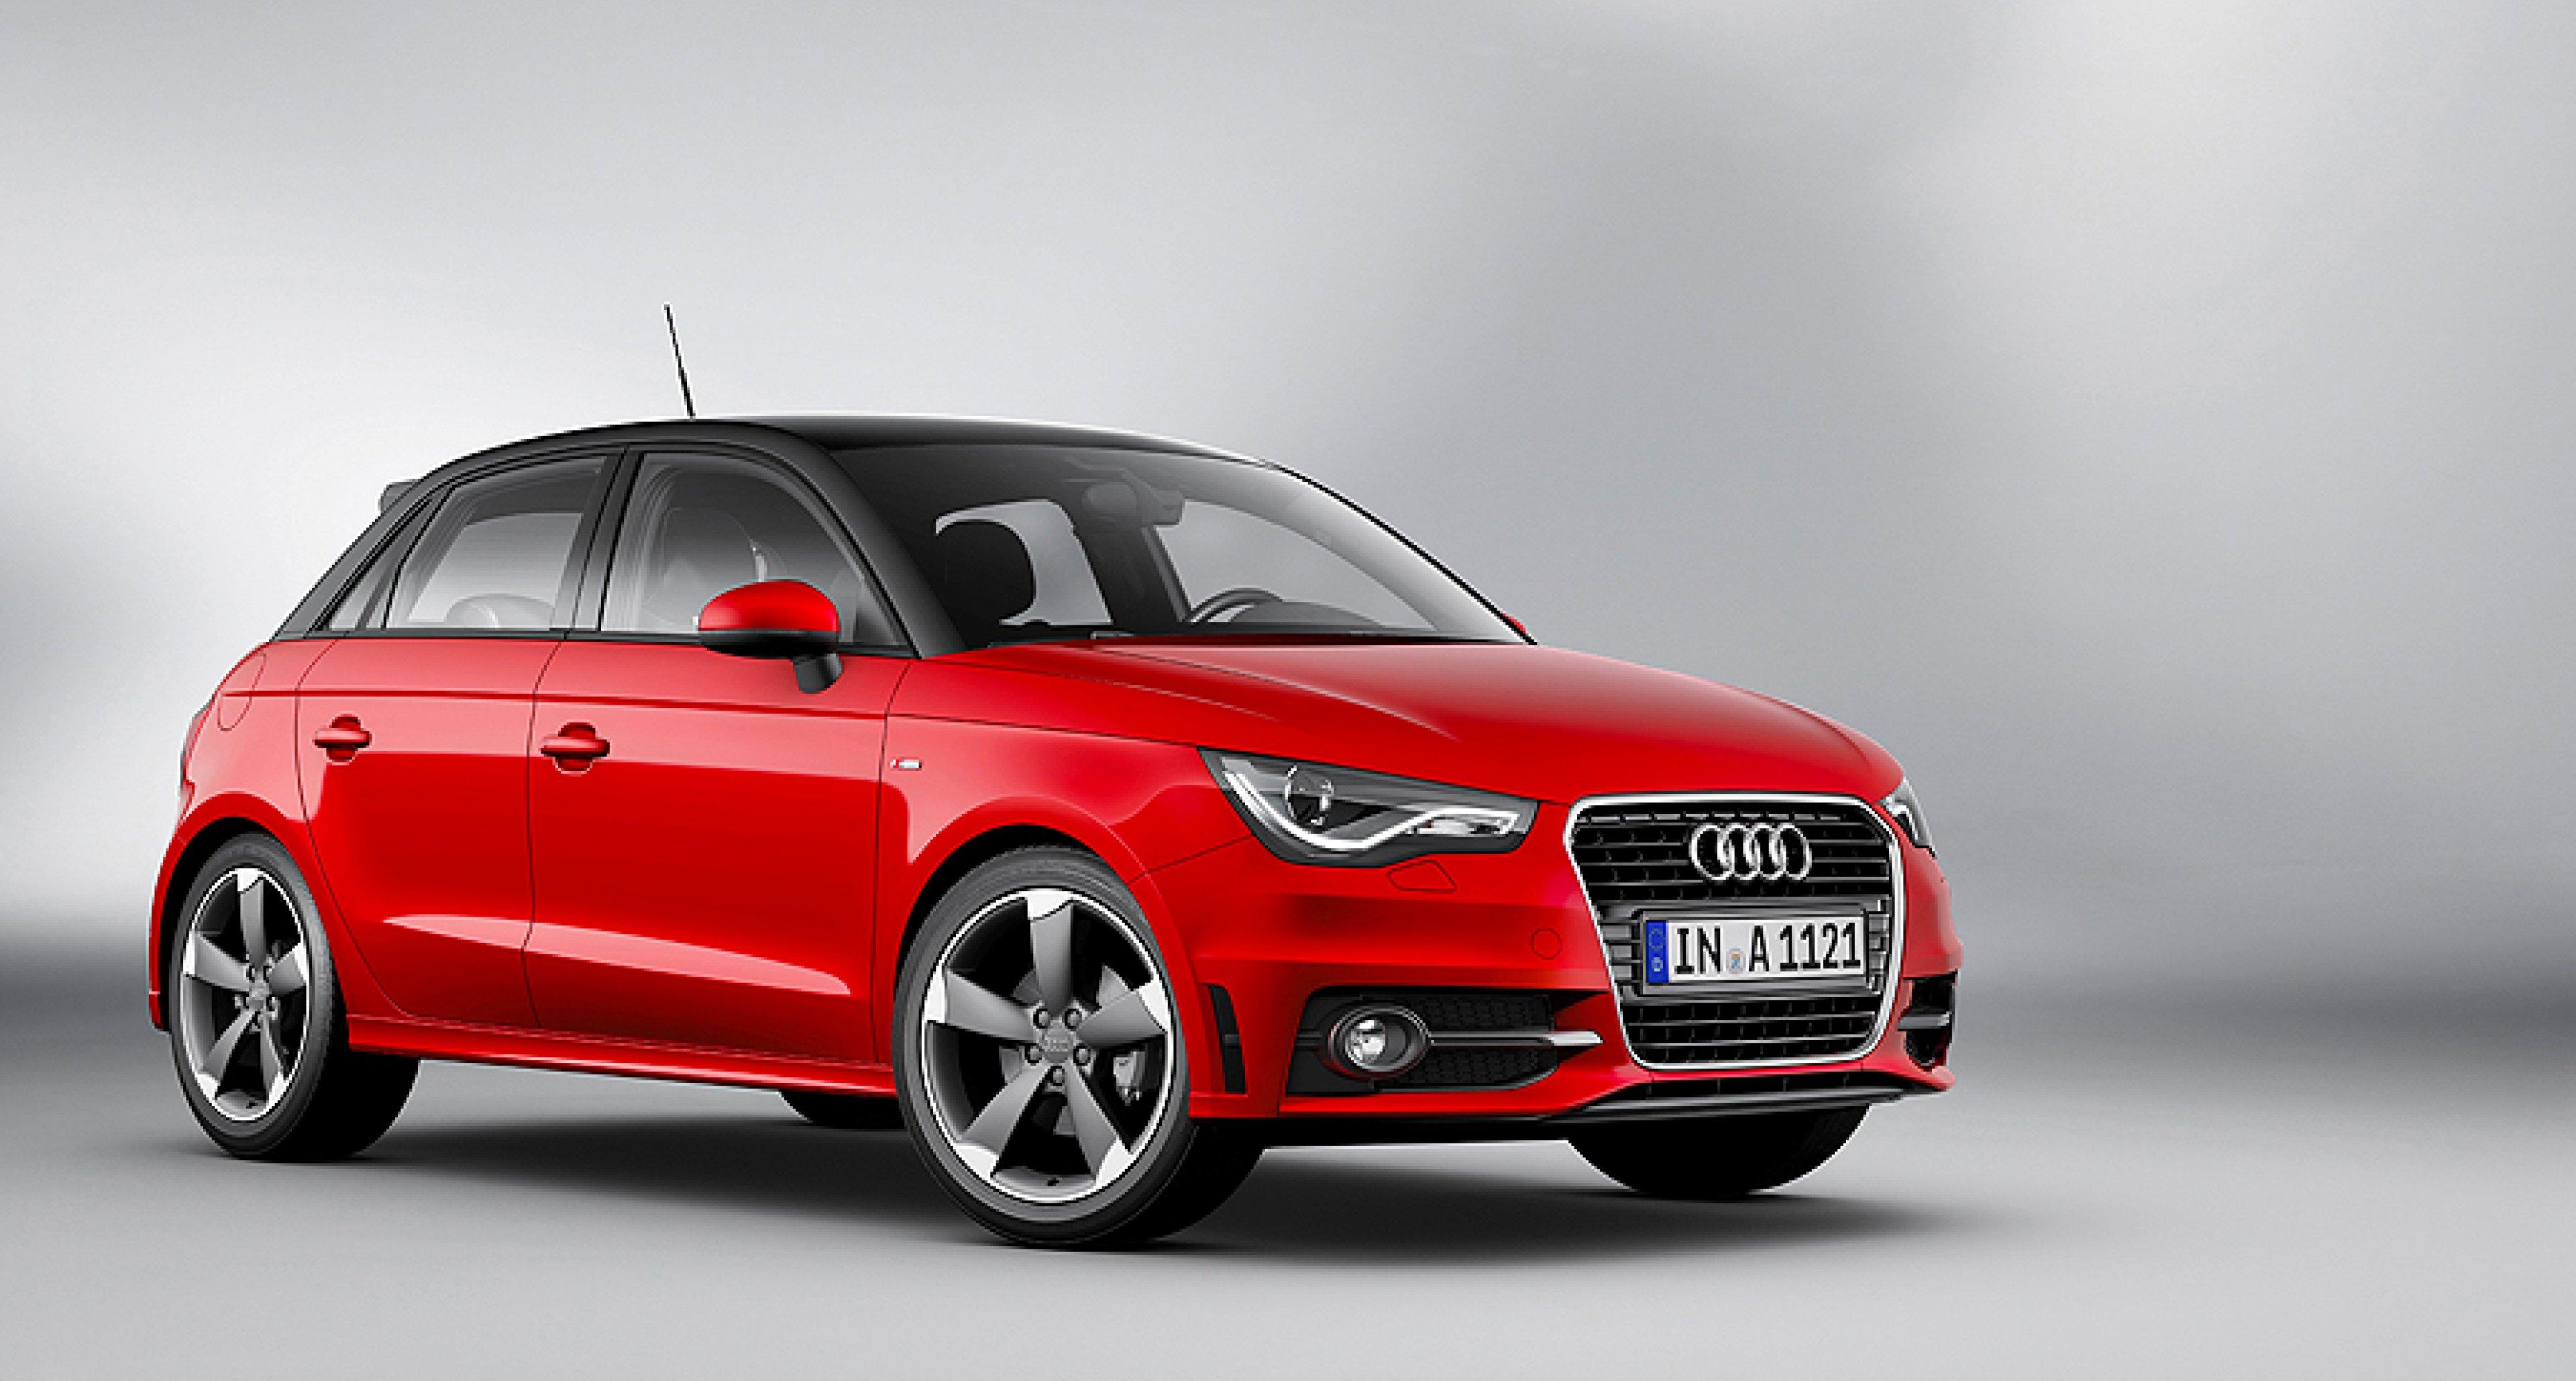 Audi A1 Sportback: Five-door supermini for 2012 delivery